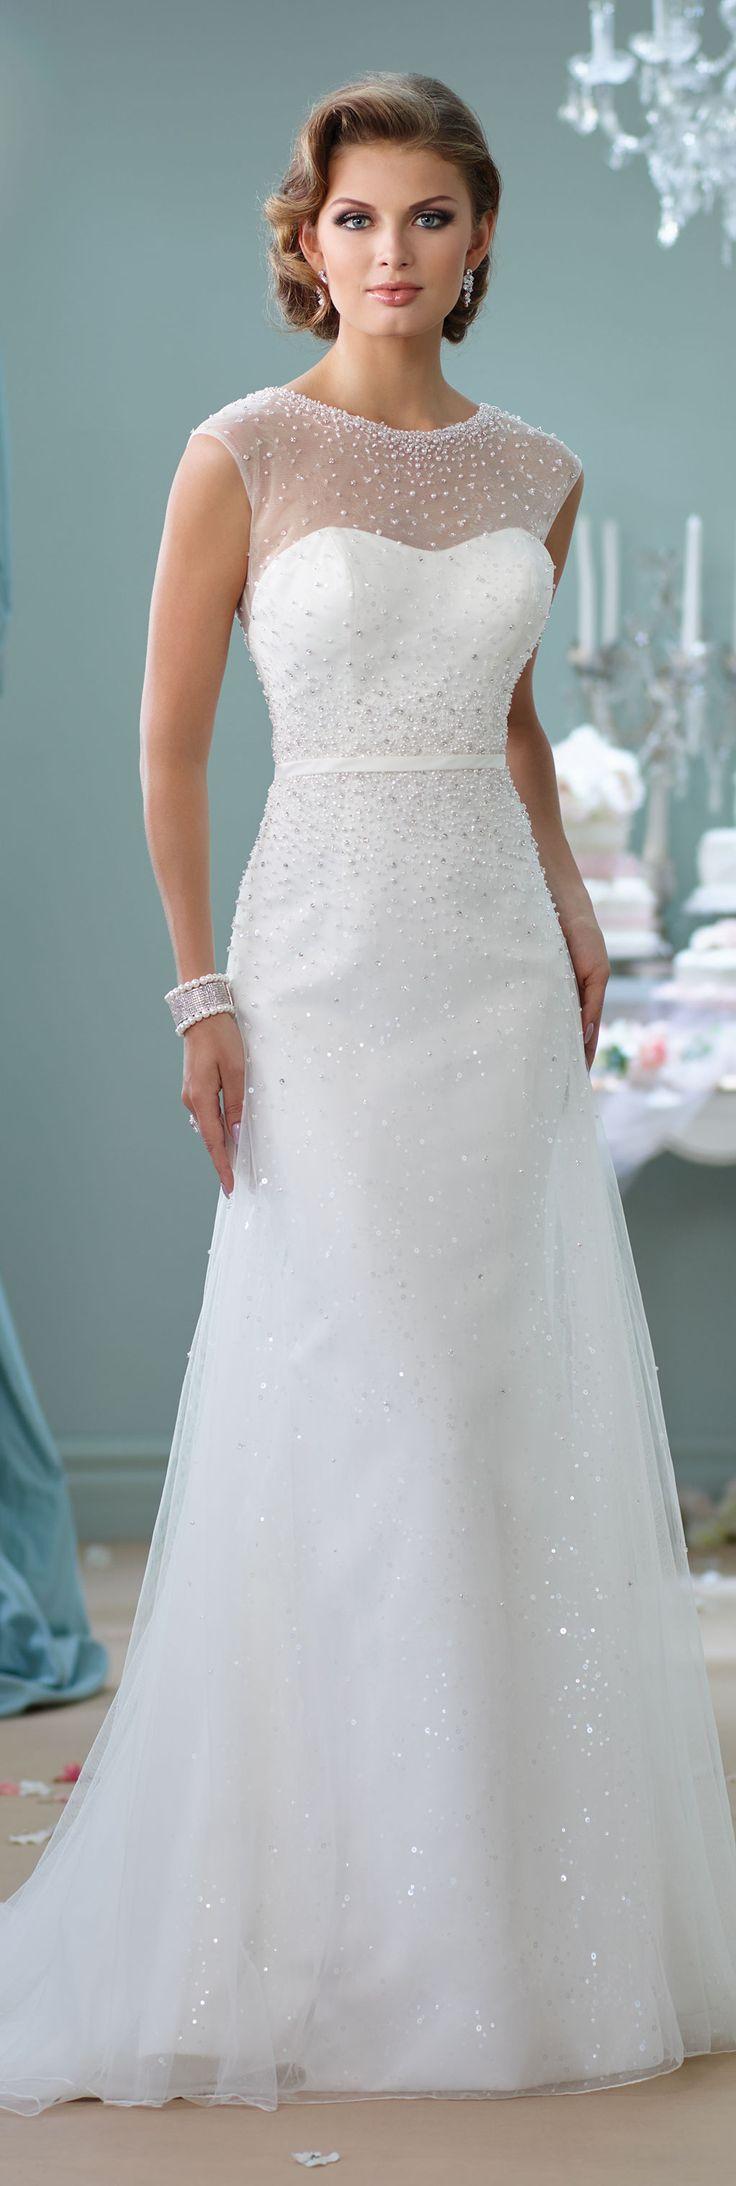 Wedding Dresses by Mon Cheri - Enchanting Spring 2016 ~Style No. 116142 #illusionbackweddingdress